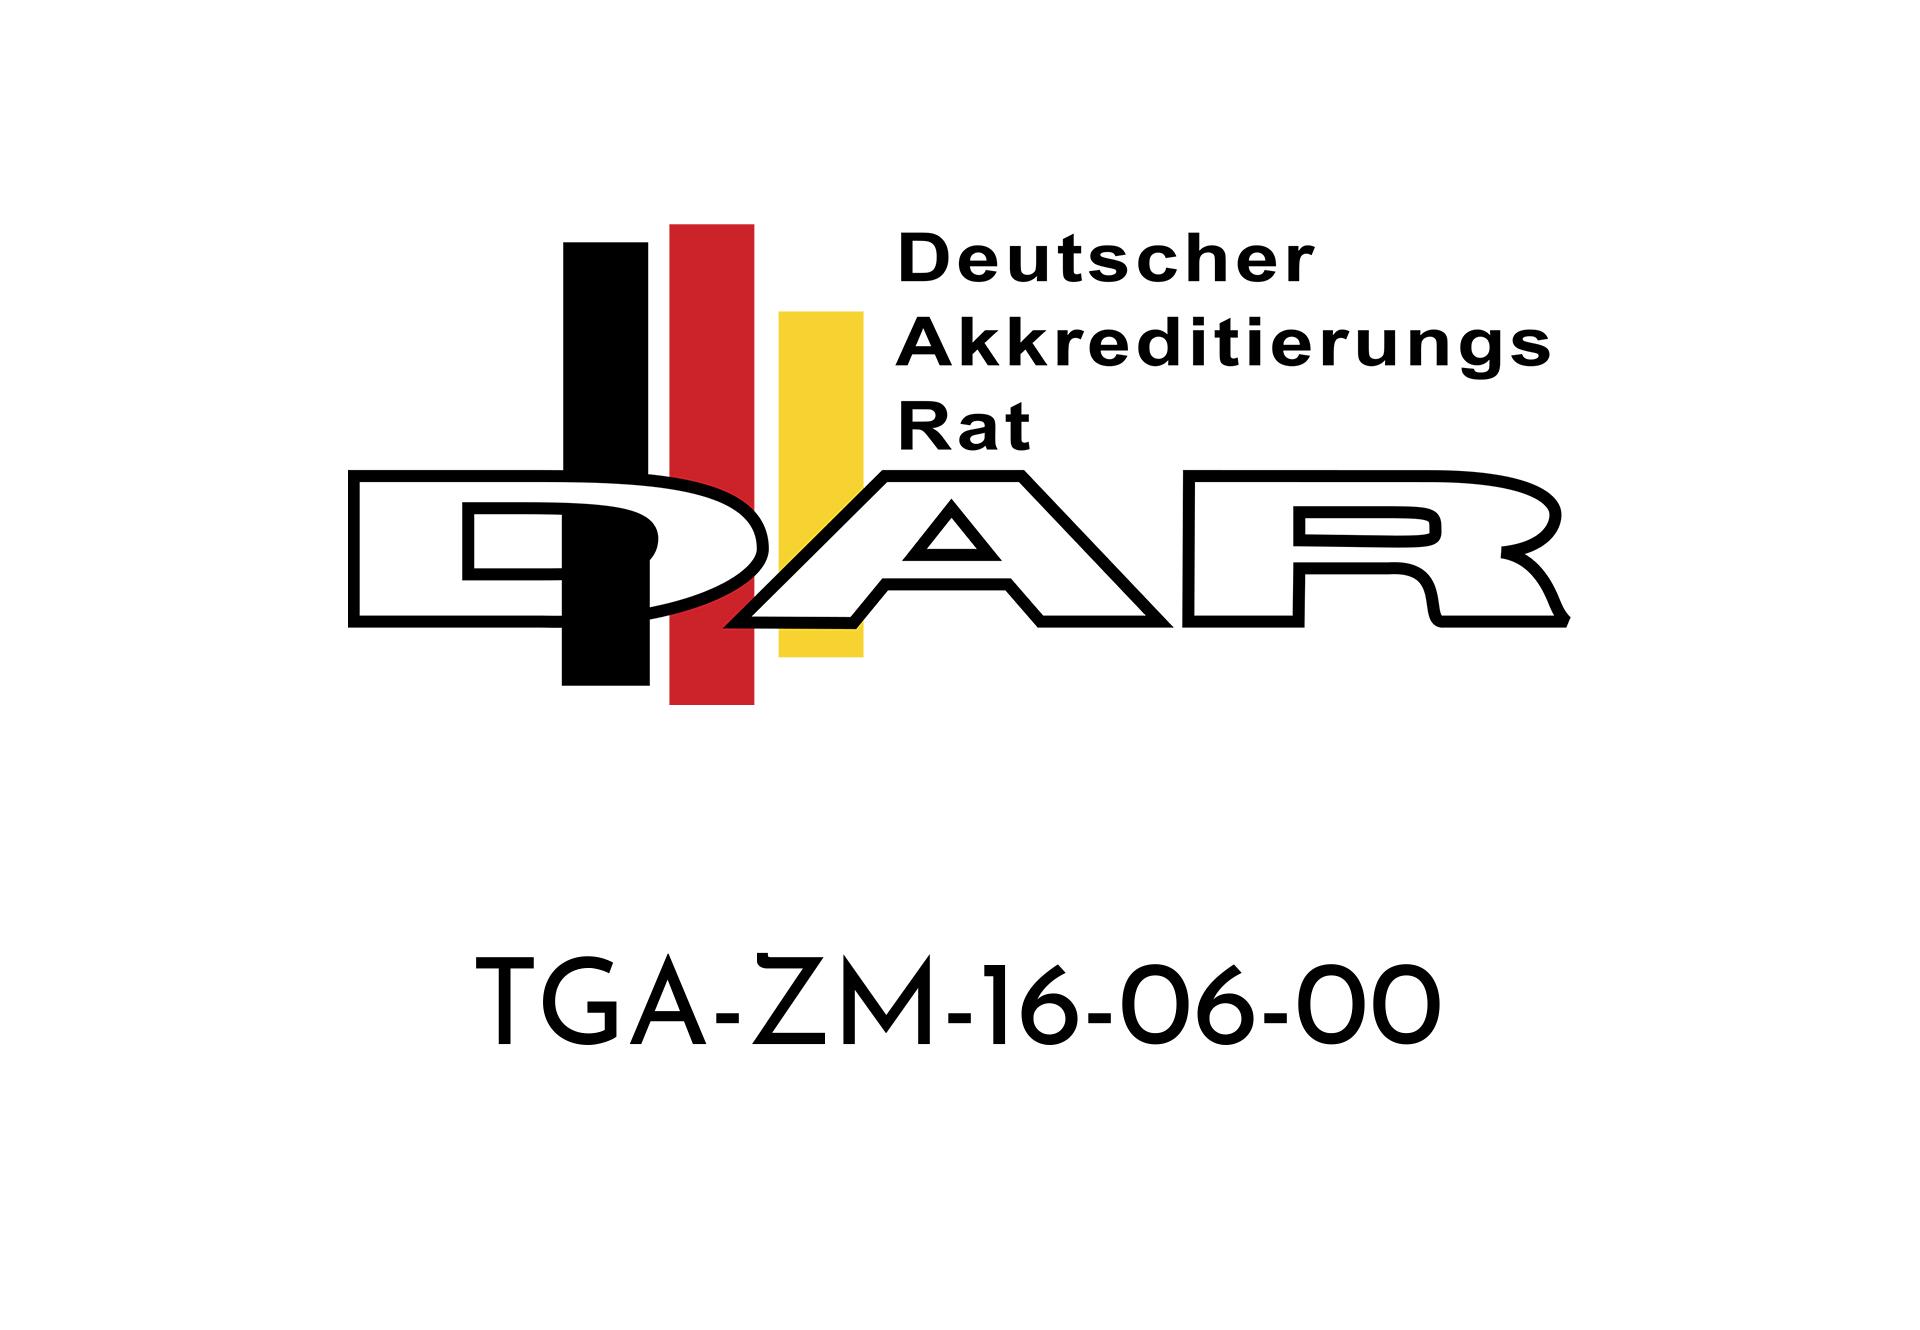 TGA-ZM-16-06-00